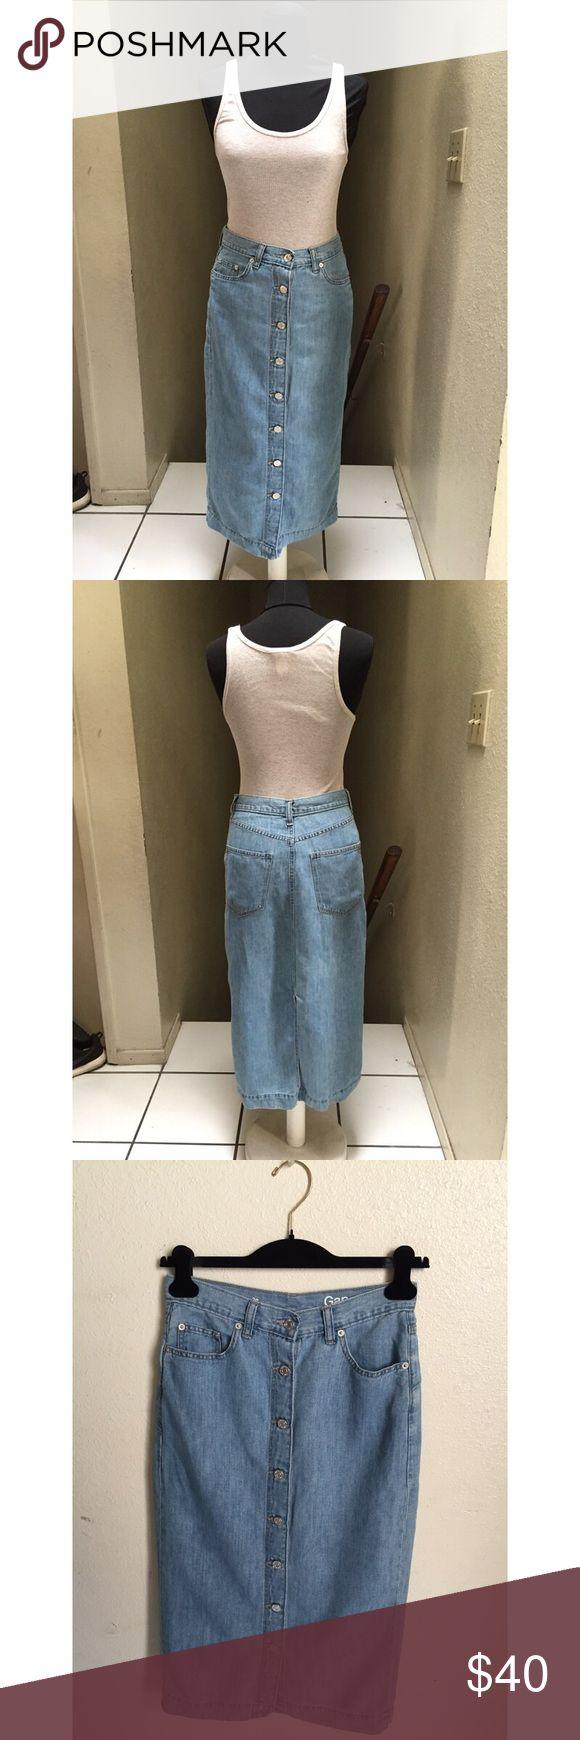 Gap Skirt Medium length, front button up, light wash denim skirt. Open to offers GAP Skirts Midi